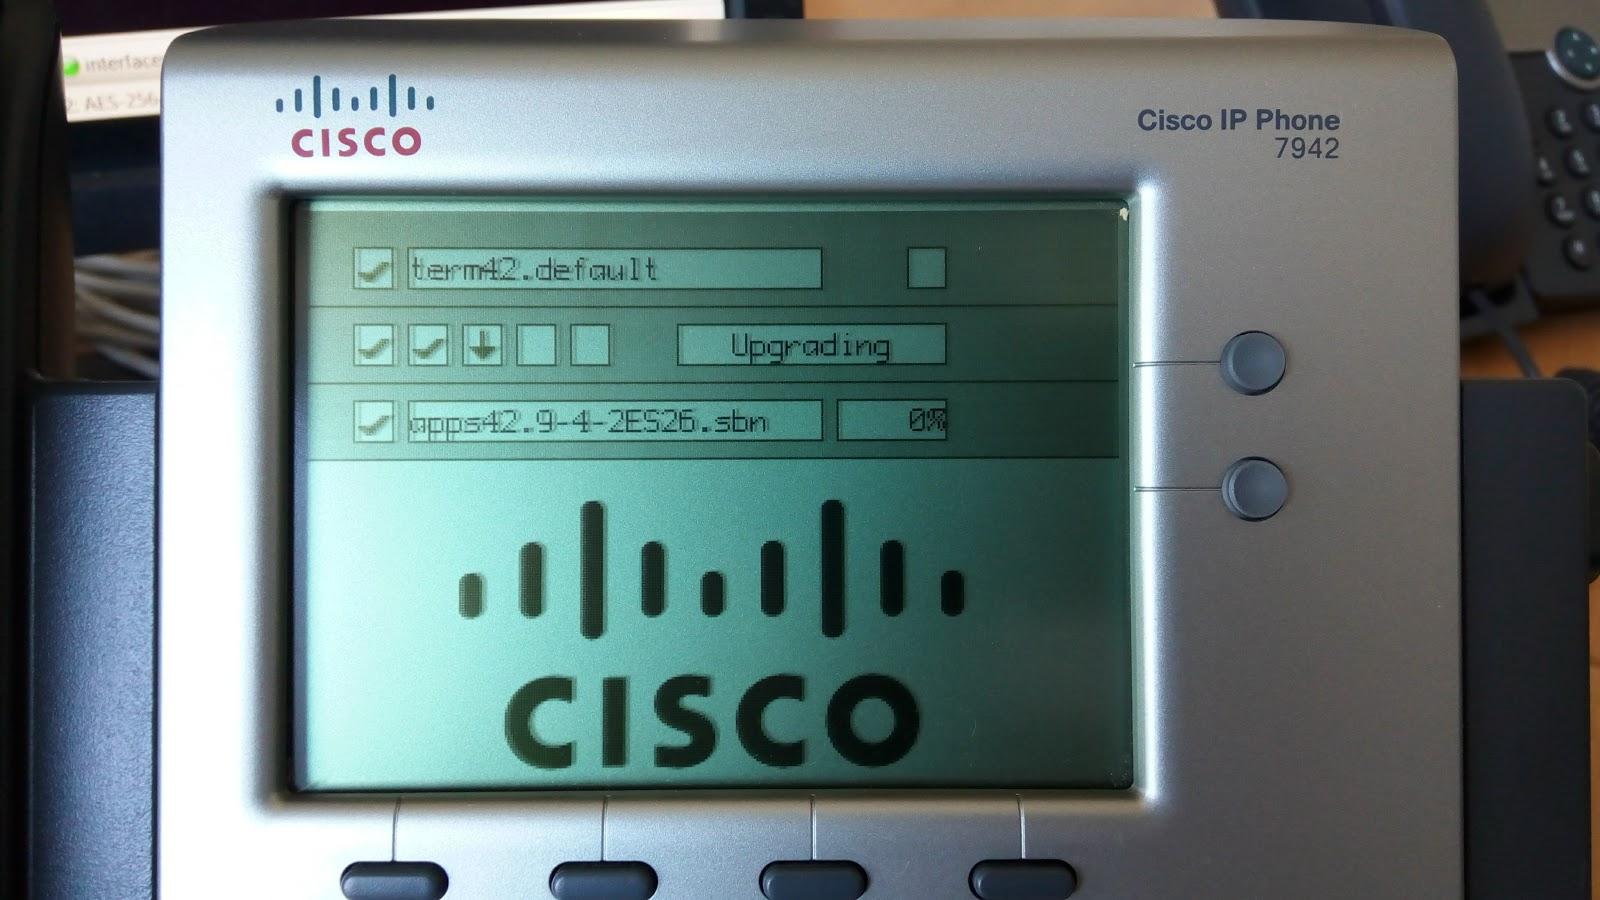 Cisco 7942 Manual Firmware upgrade